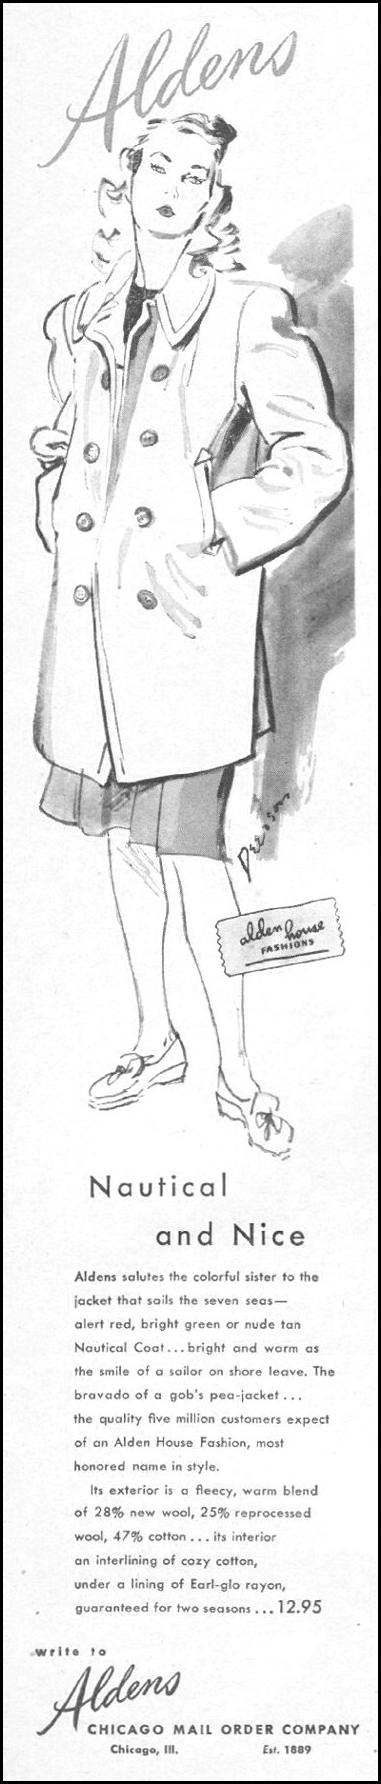 ALDEN HOUSE FASHIONS LIFE 06/22/1942 p. 98